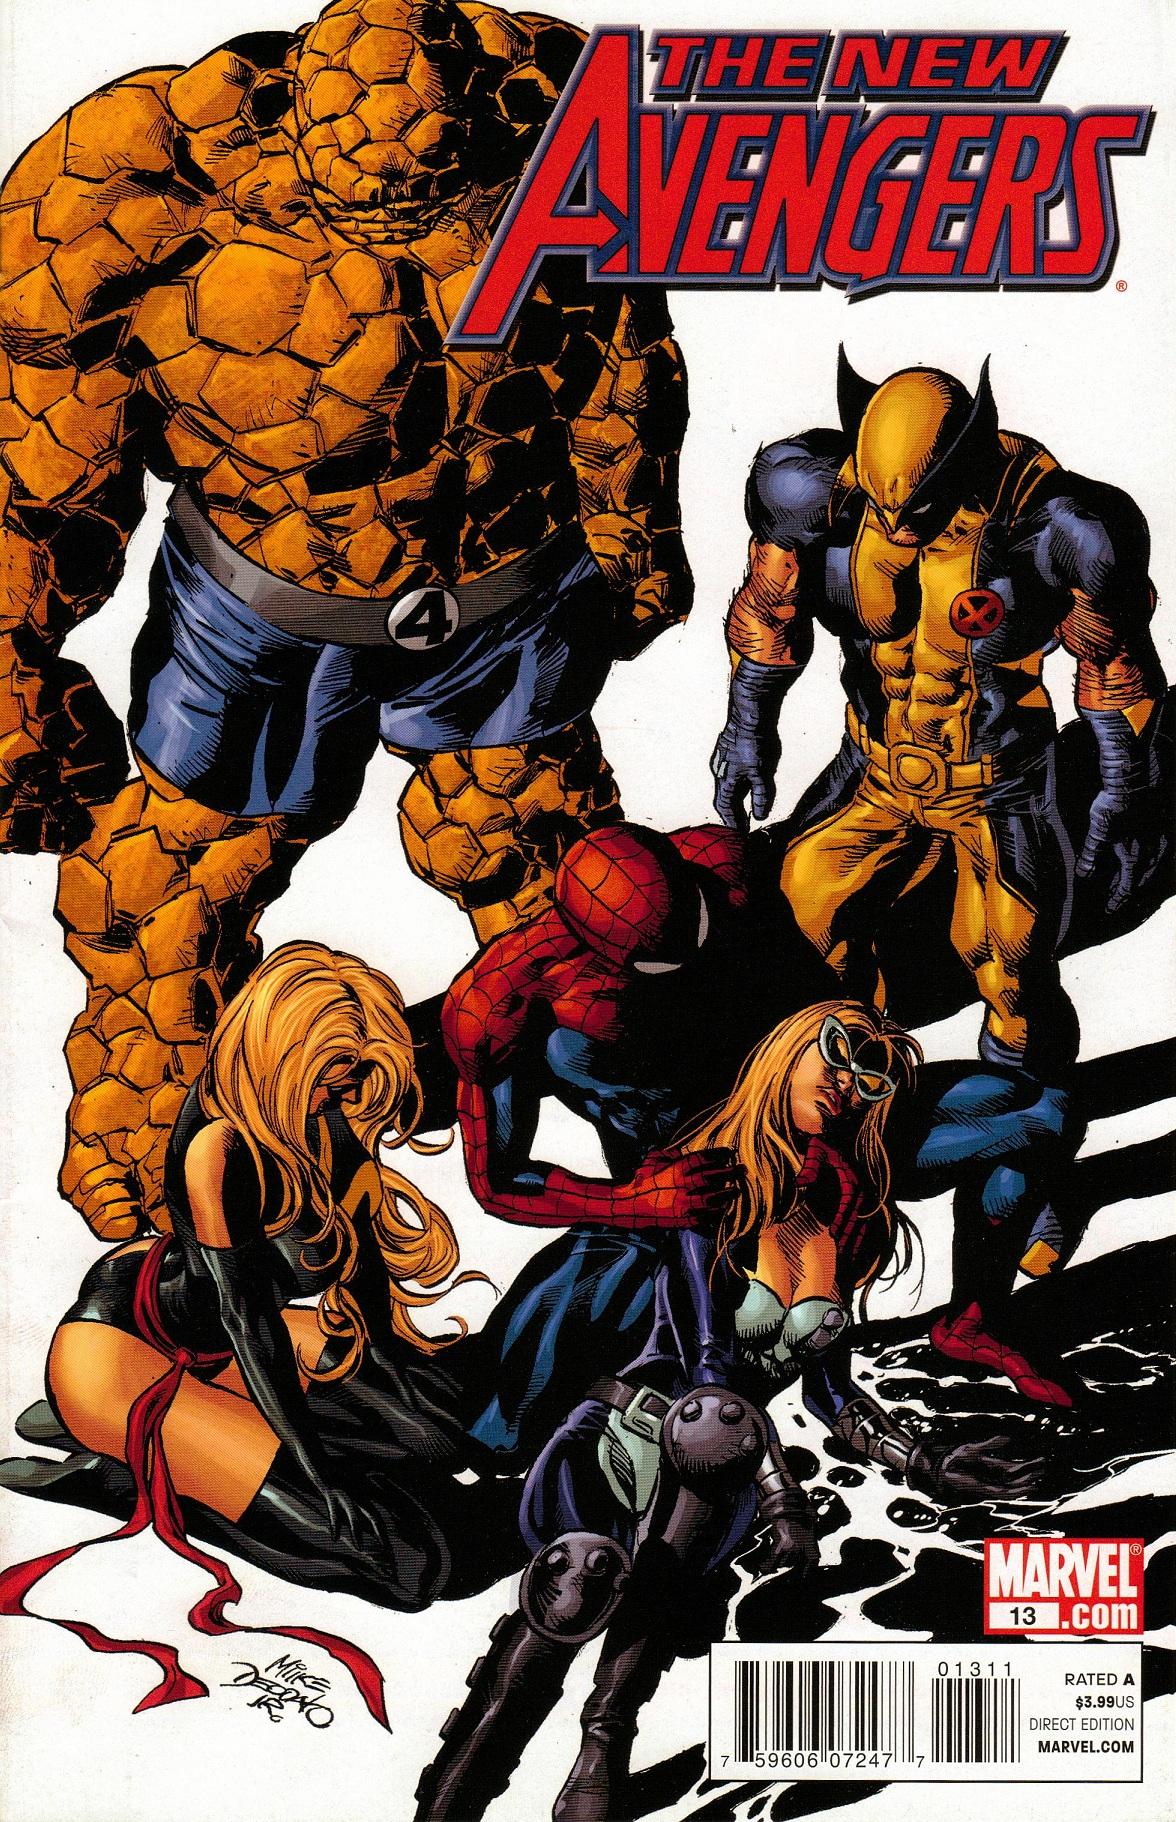 New Avengers Vol 2 13